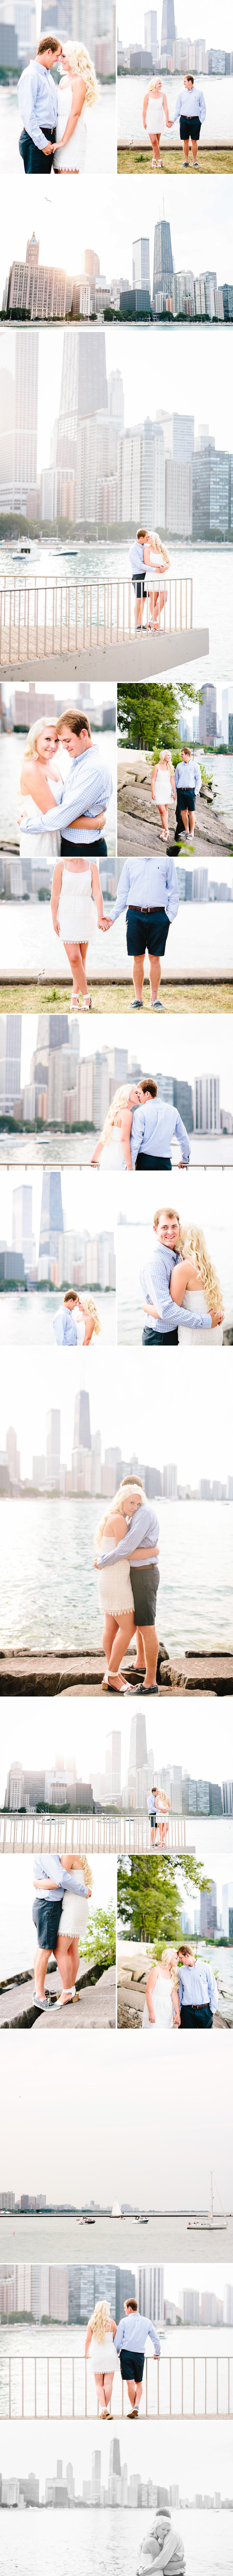 chicago-fine-art-wedding-photography-jm